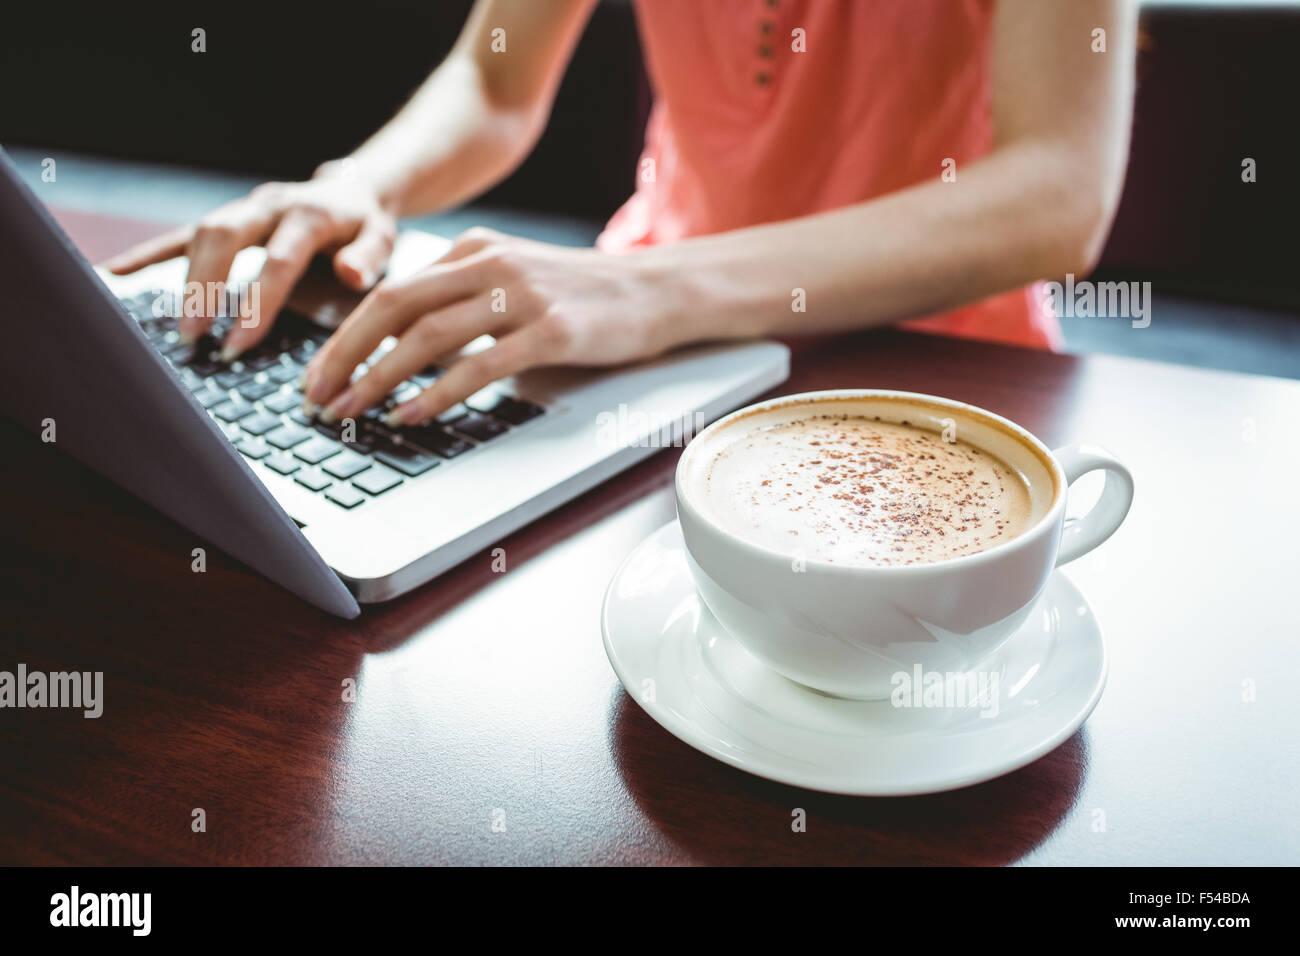 Estudiantes Maduros con laptop en cafe Imagen De Stock